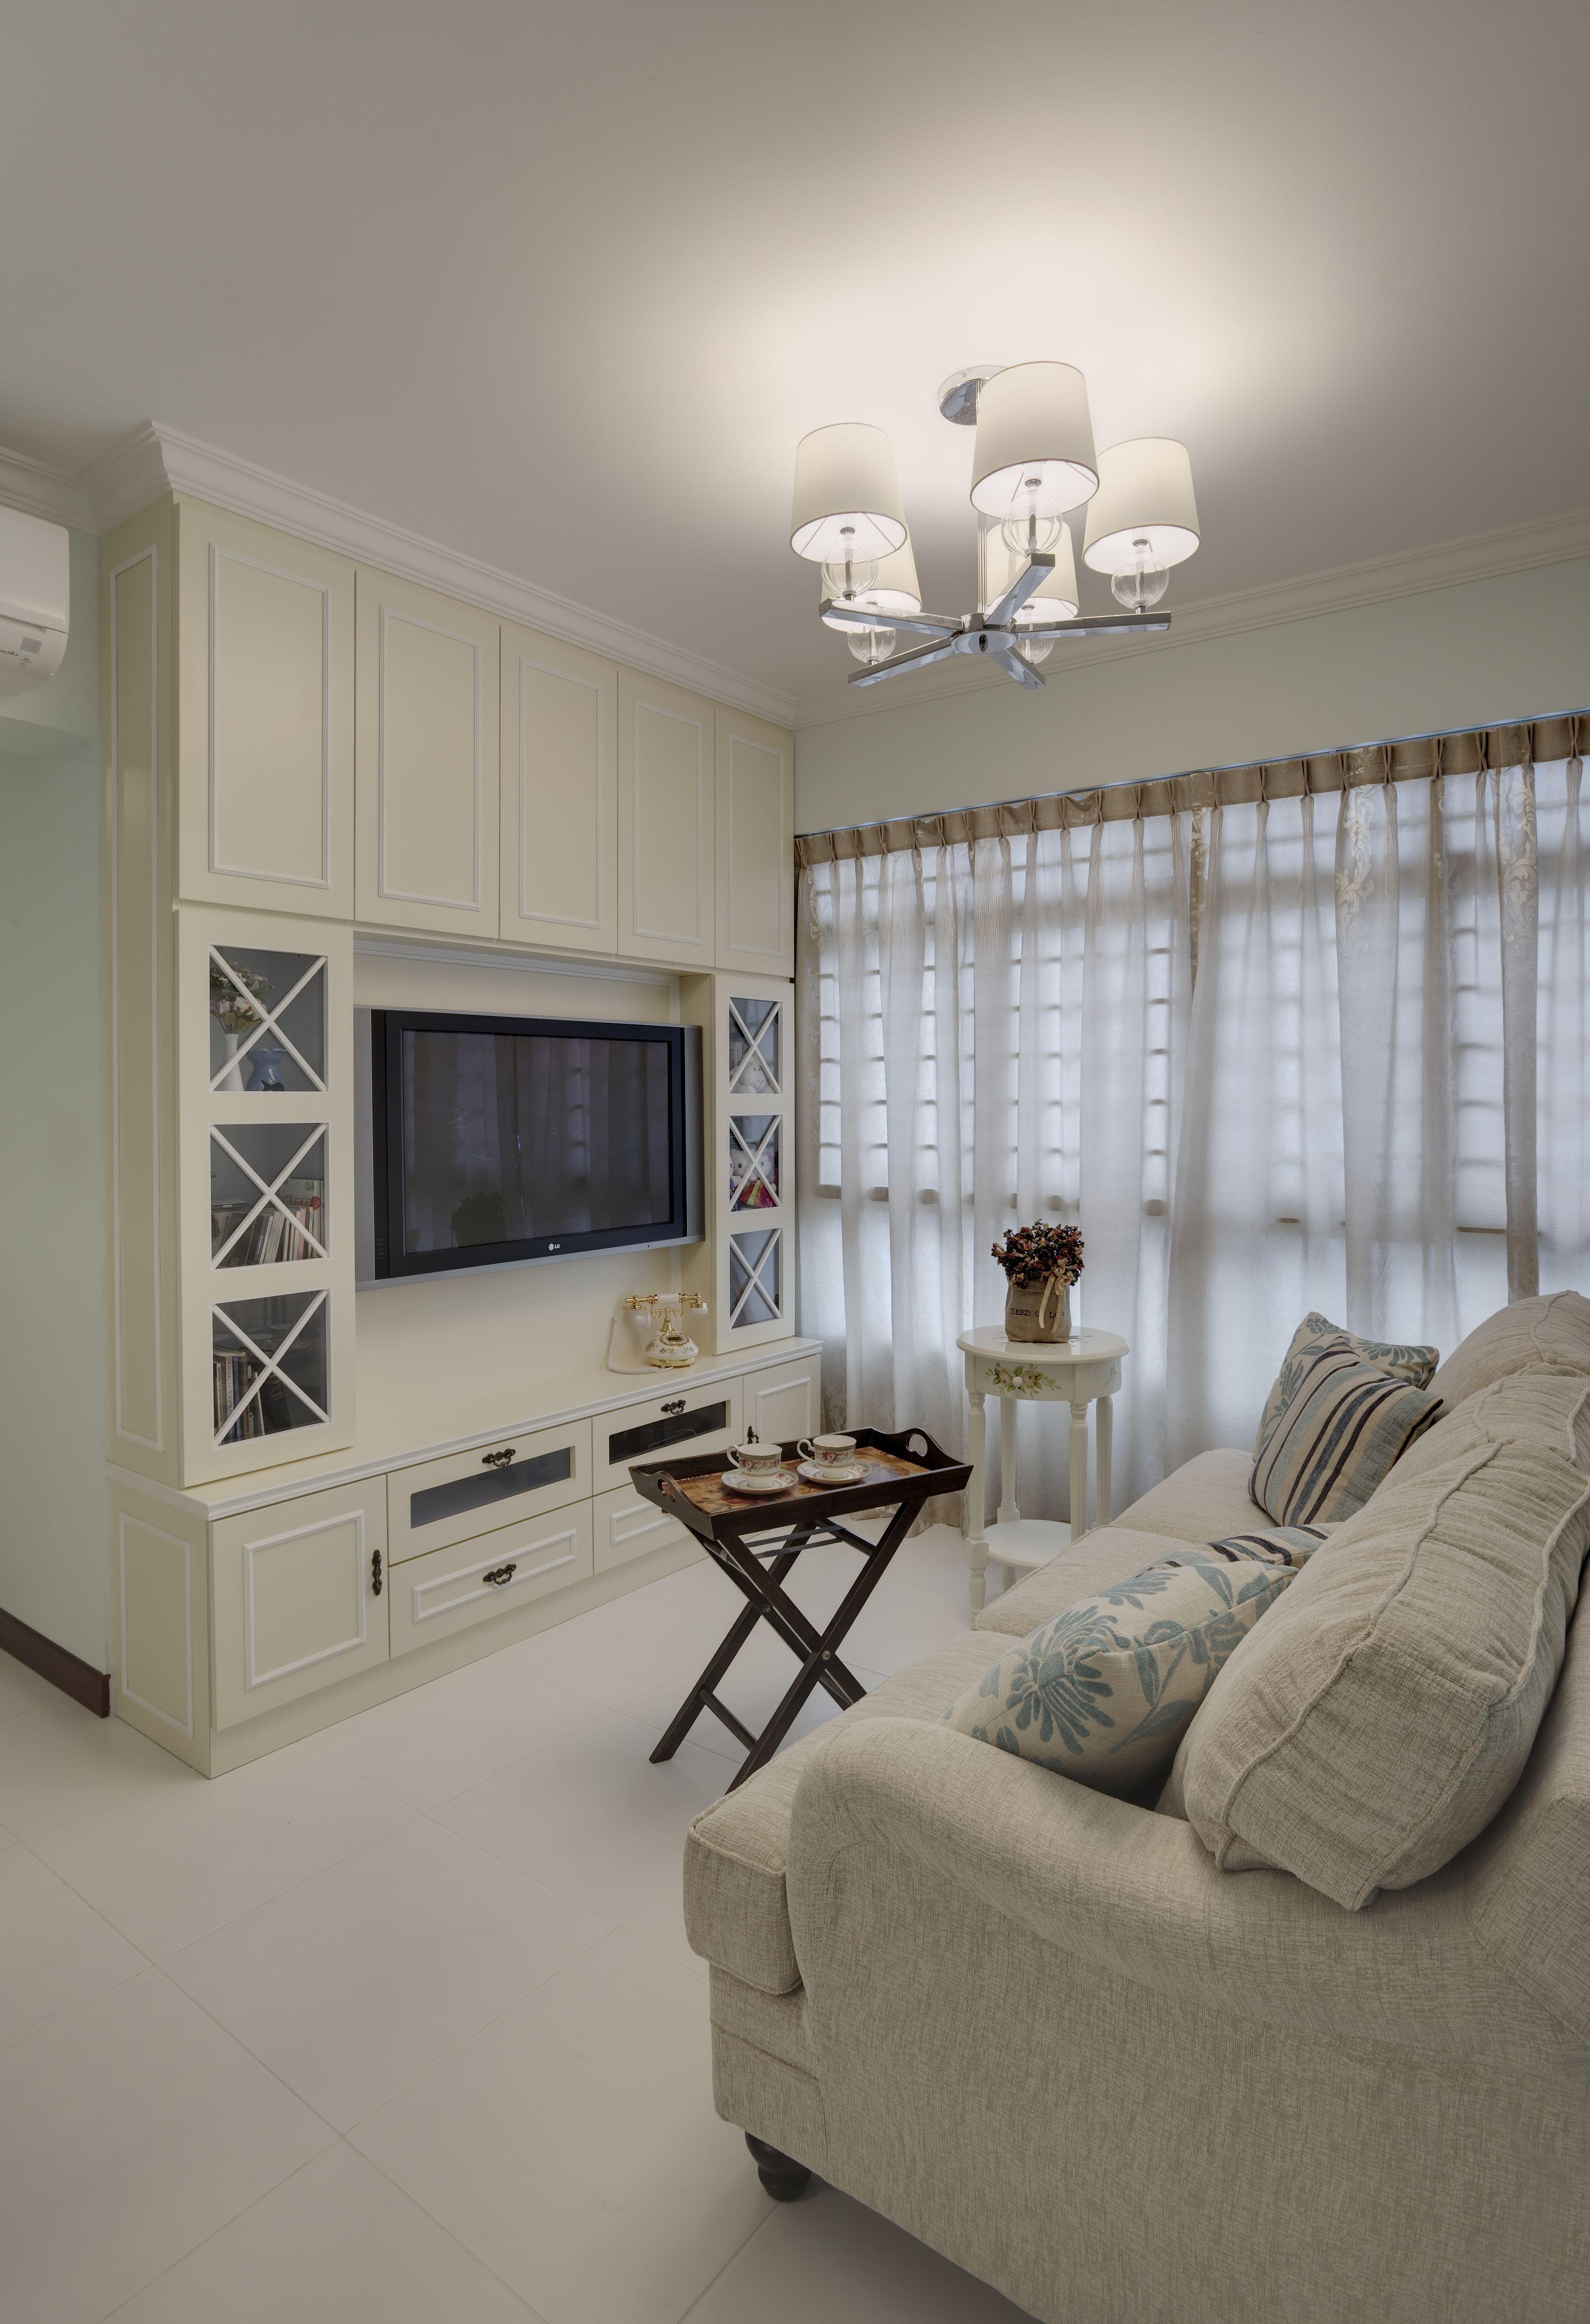 Modern Hdb Decor: HDB Home Decor Singapore Living Room Pinterest Singapore